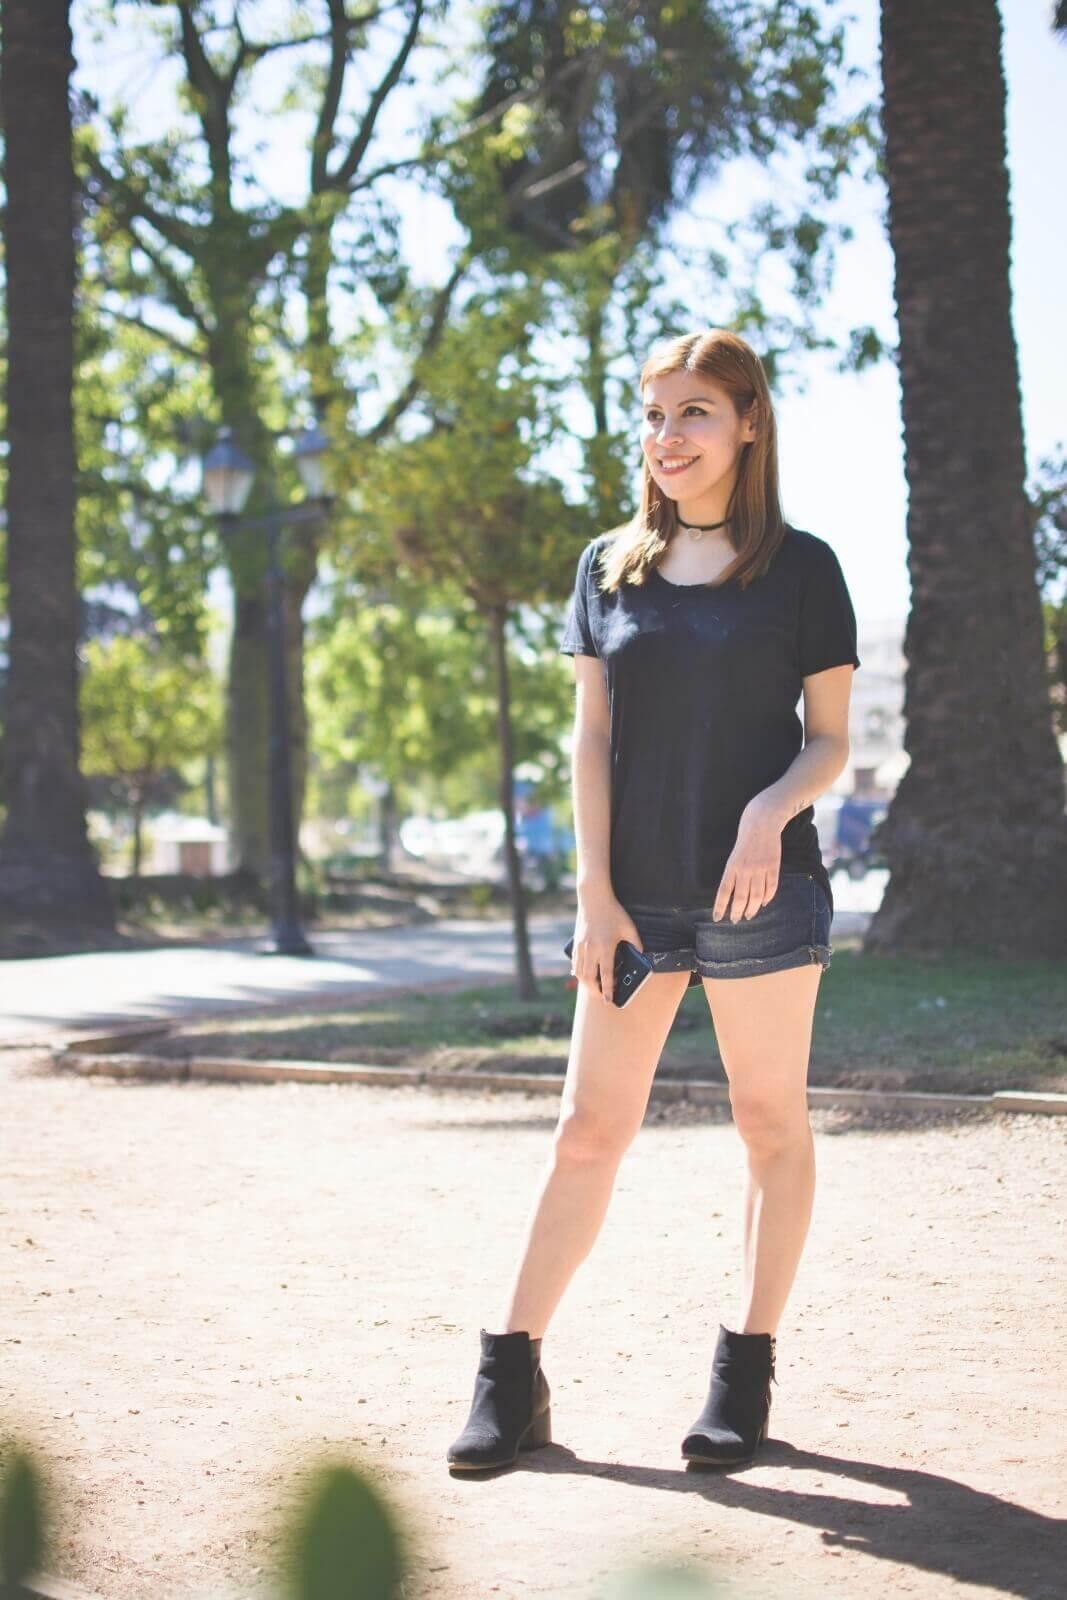 black-tshirt-jeans-california-girl-outfit-ankle-booties-summer-in-black-deborah-ferrero-style-by-deb02